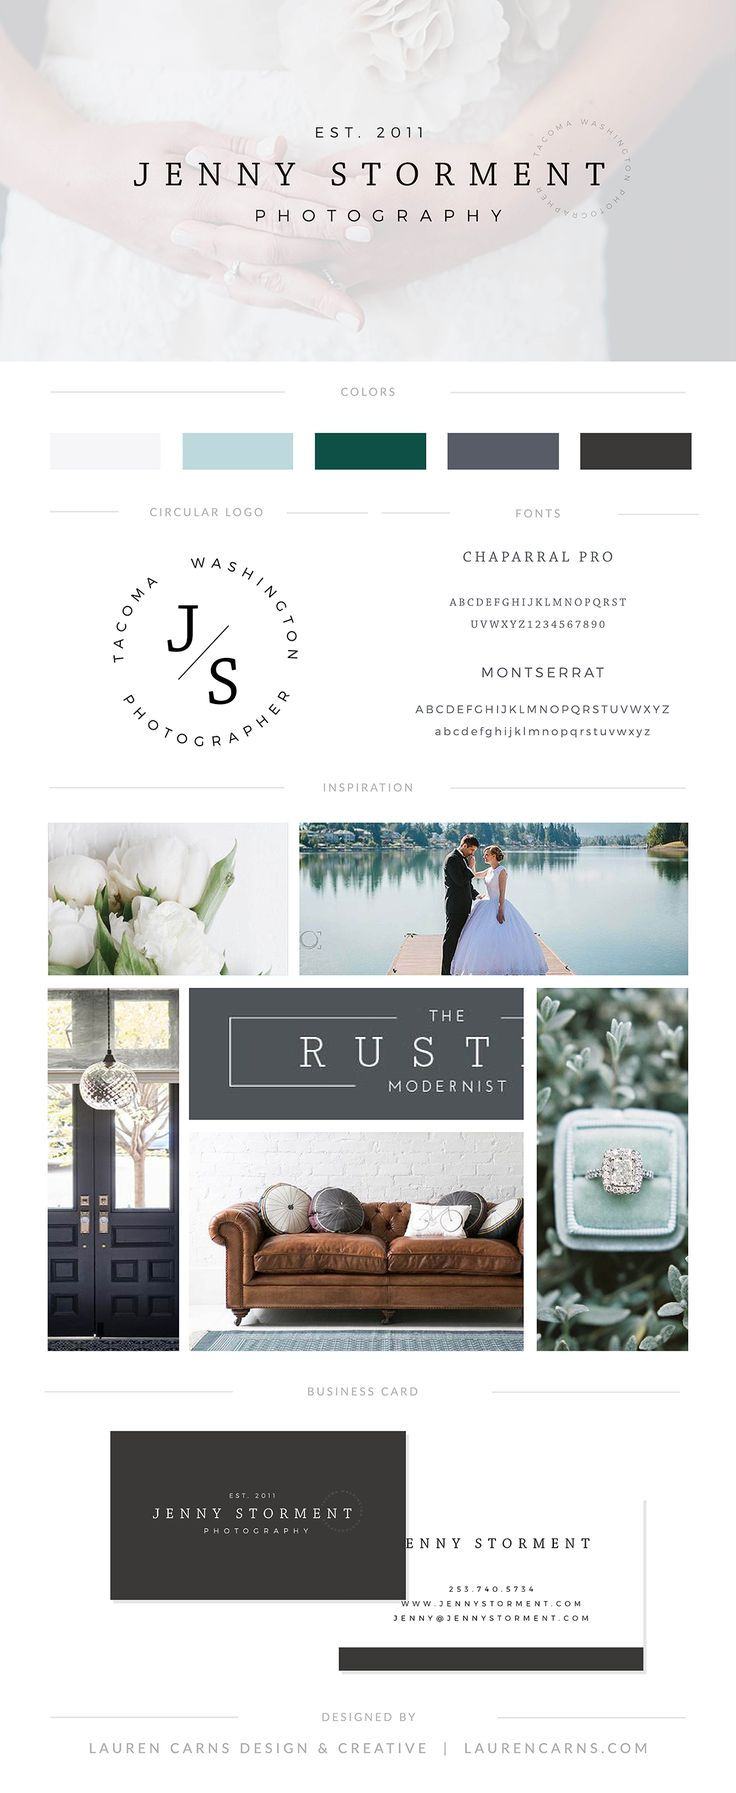 Jenny Storment Photography Branding - Lauren Carns